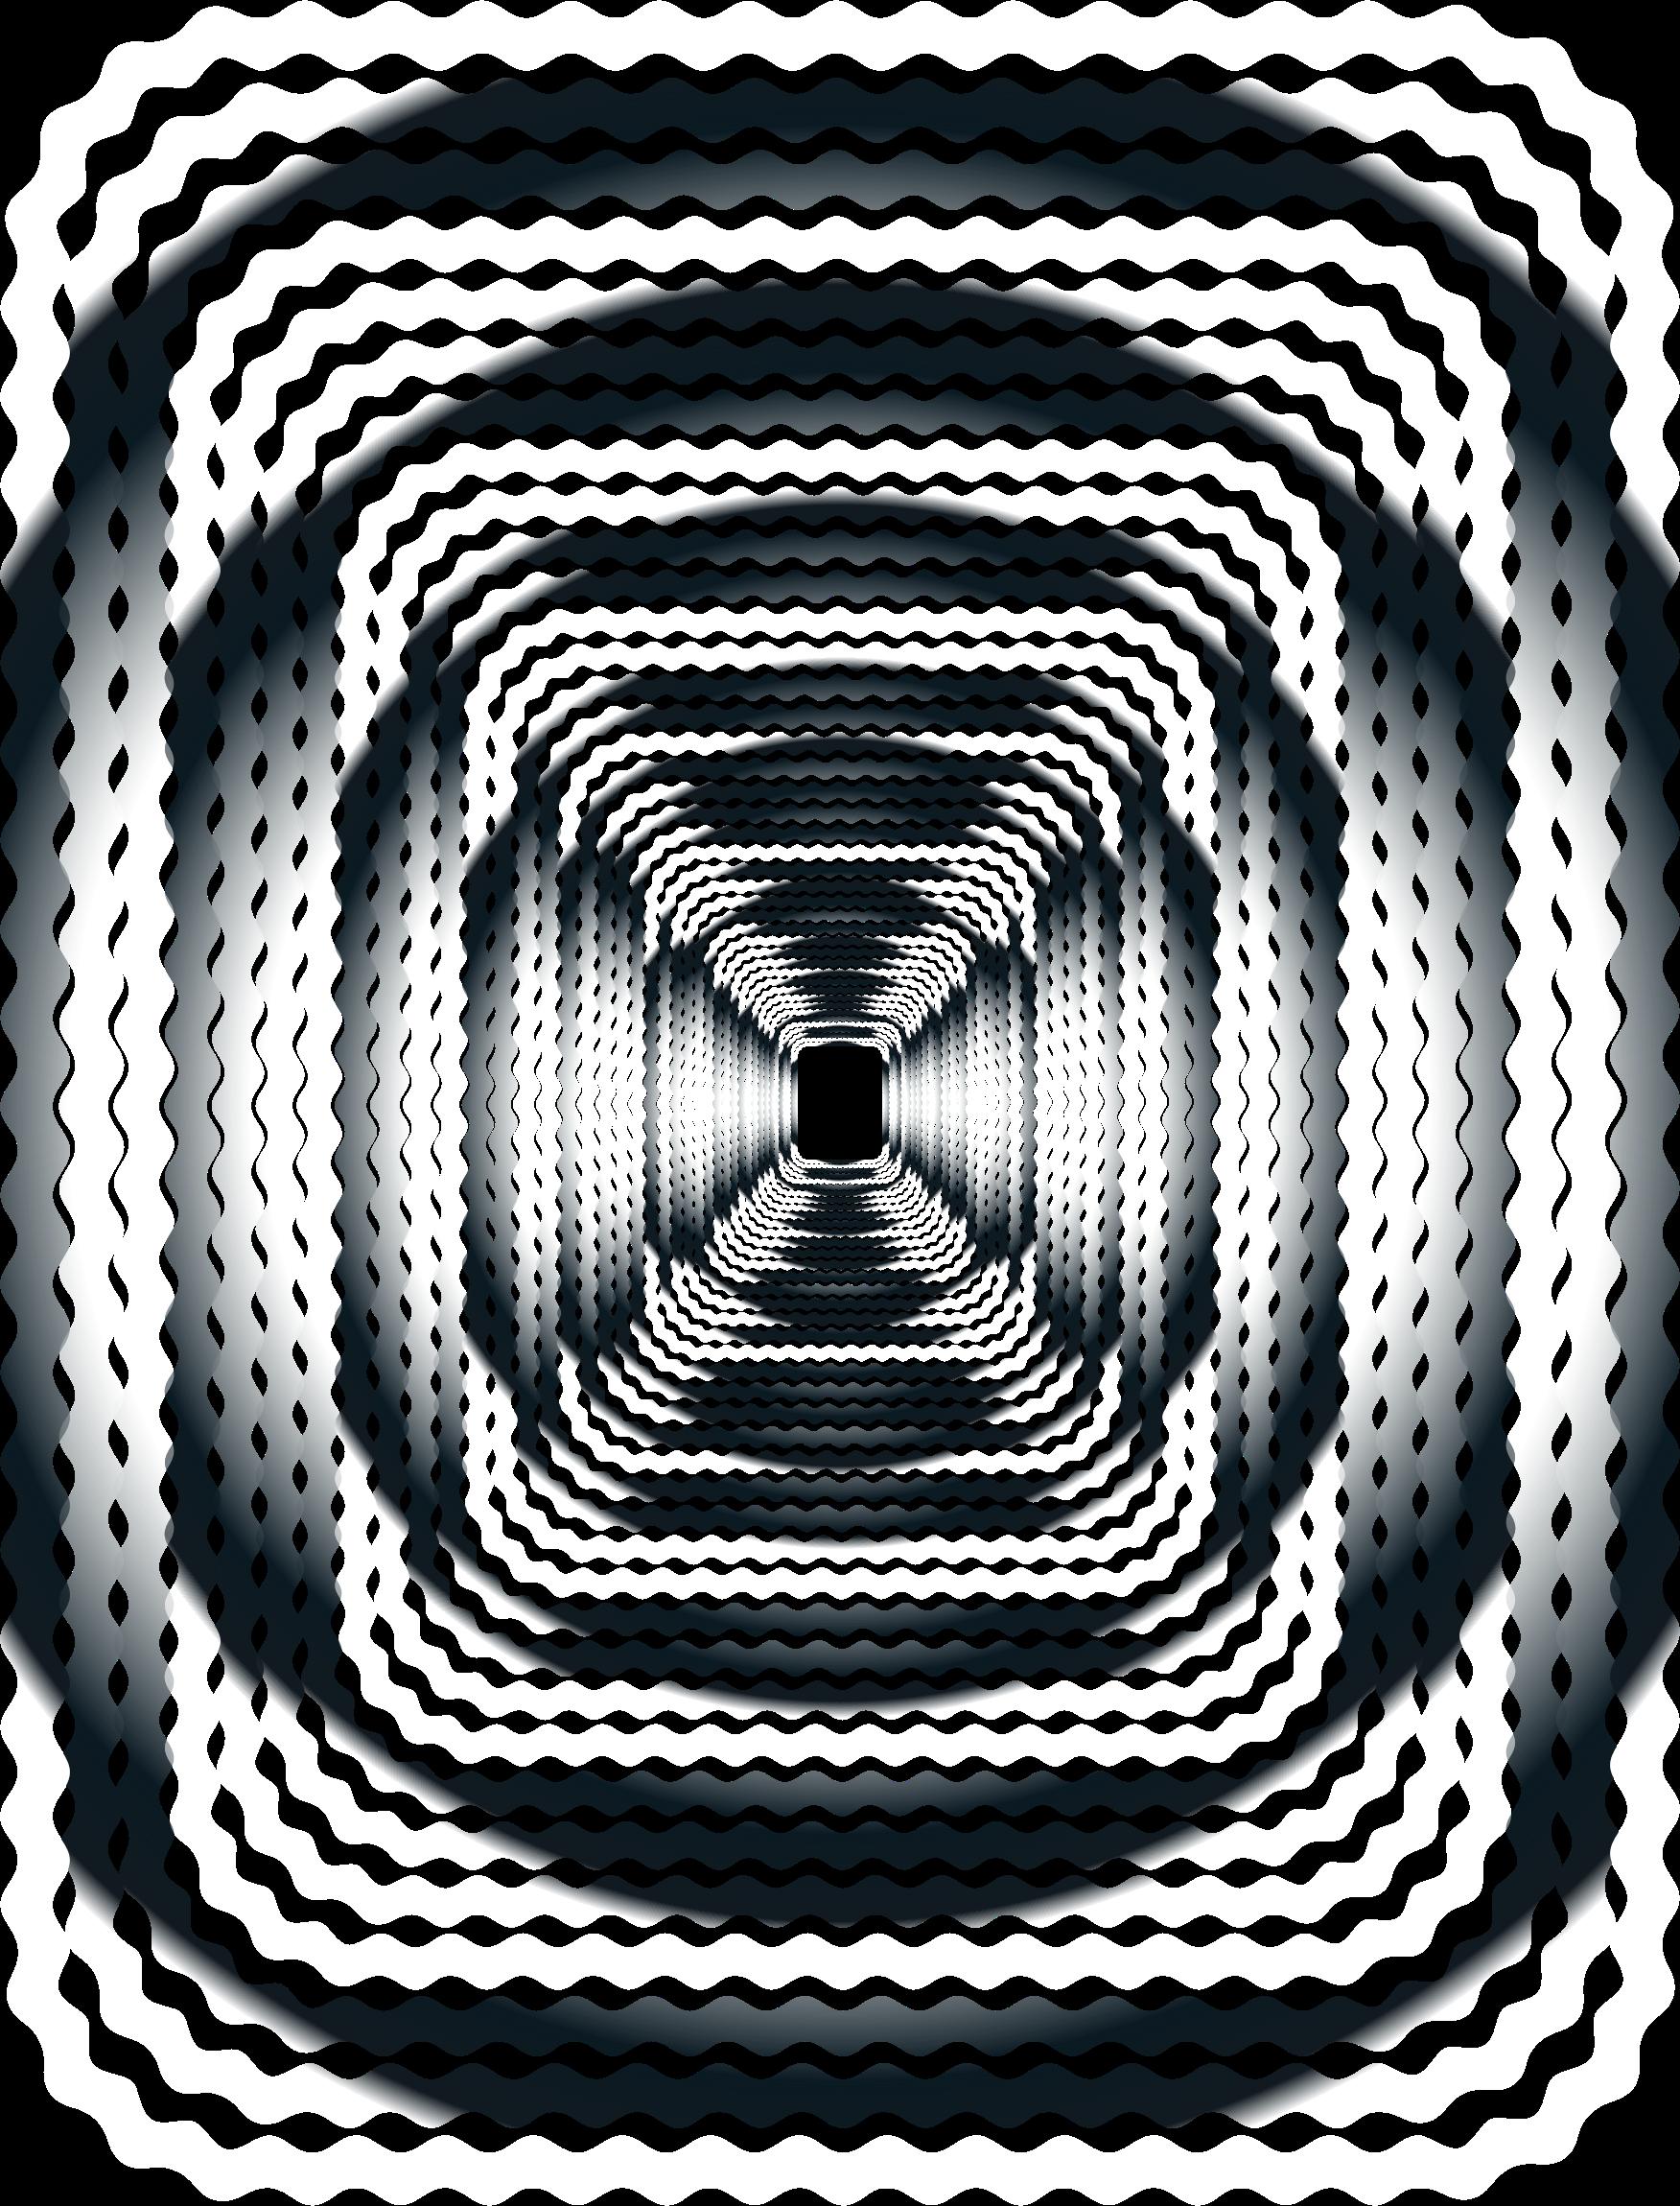 Prismatic wave perspective no. Clipart waves border